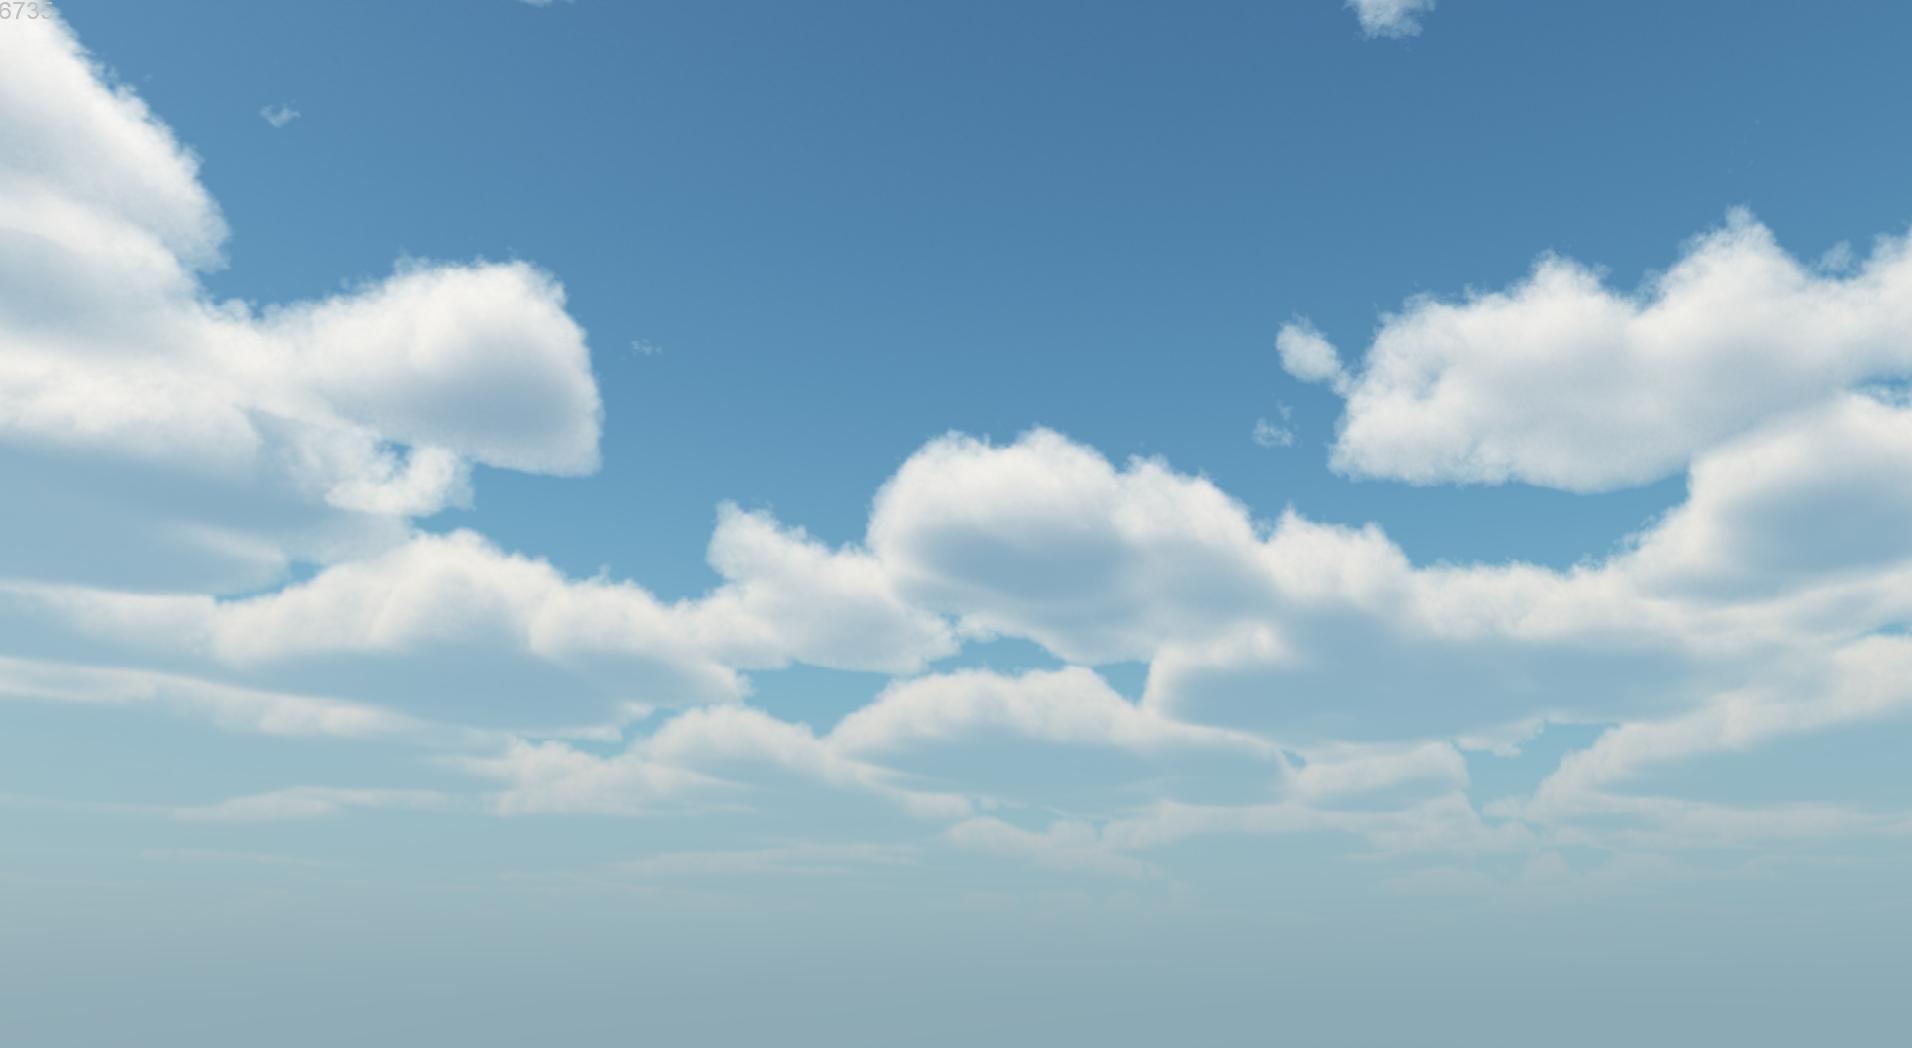 Skybox CUBE Texture